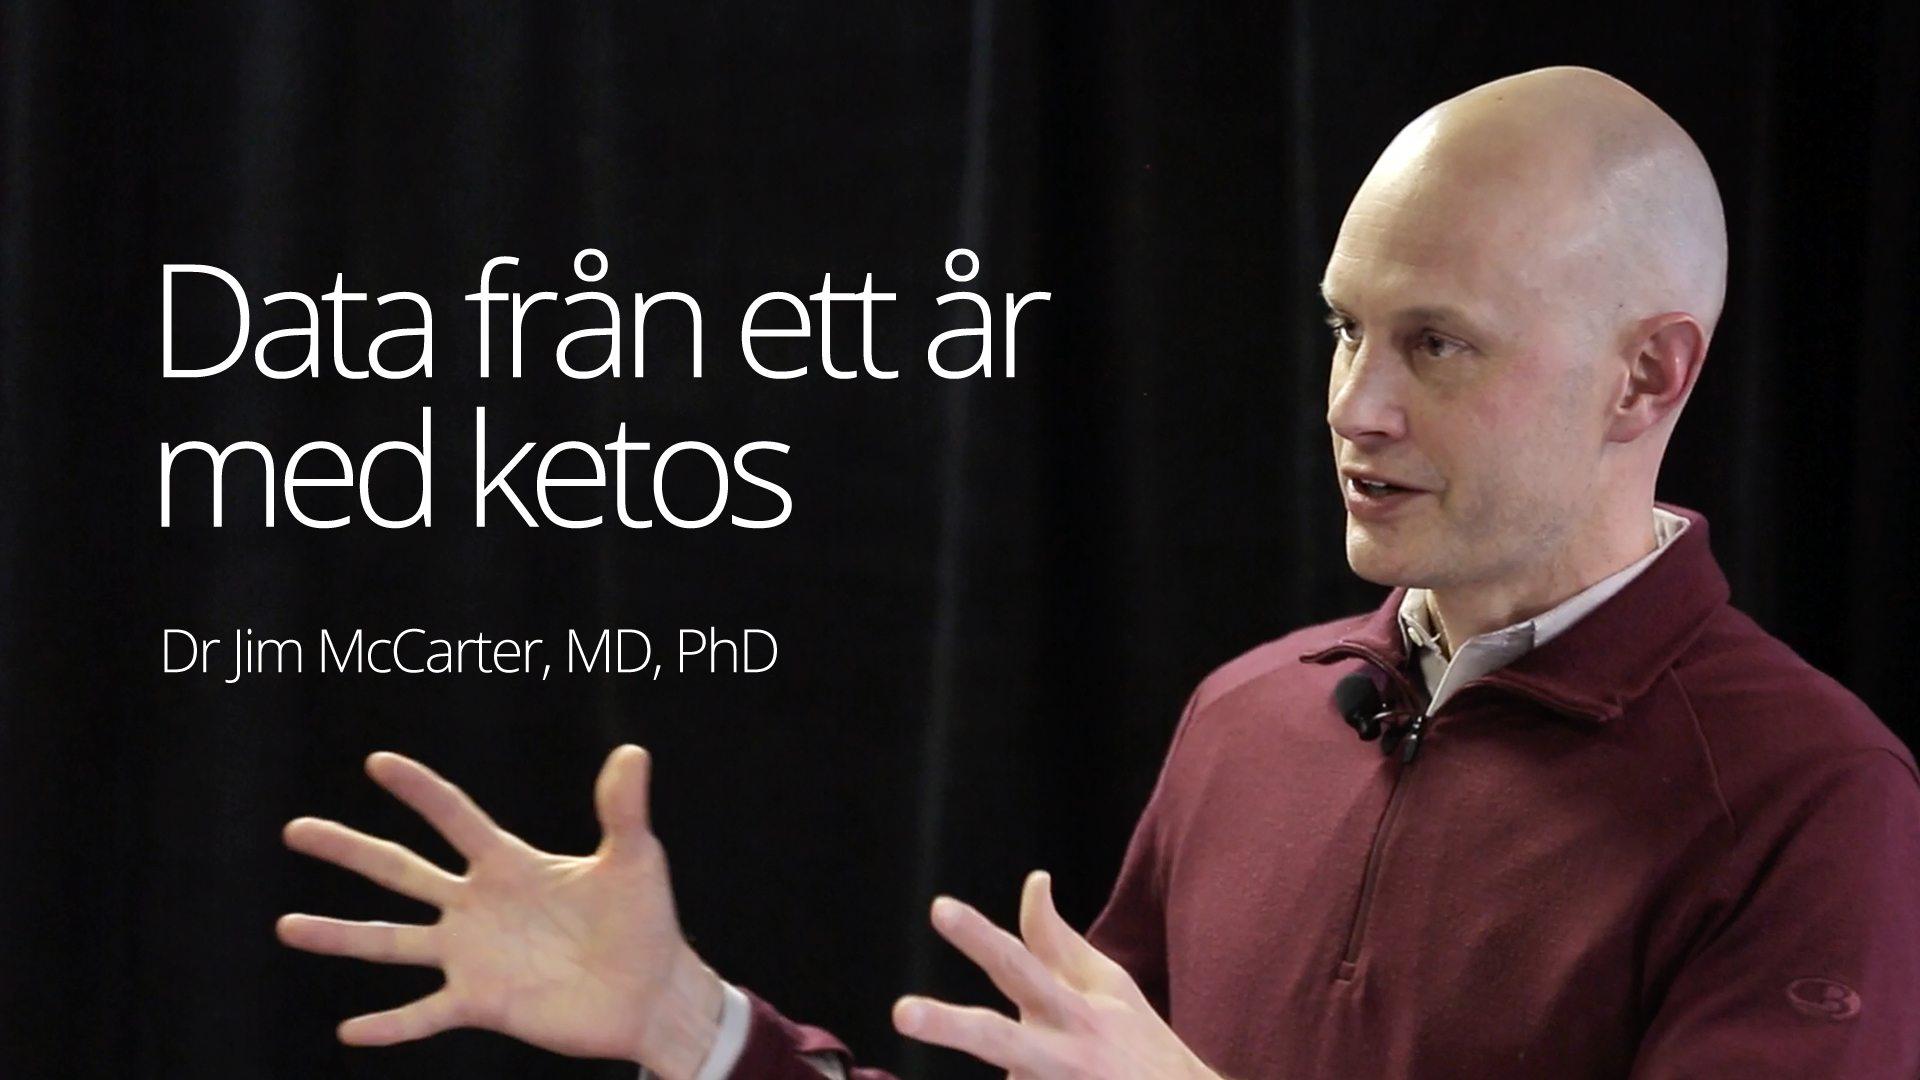 Dr. Jim McCarters presentation från Vail 2016